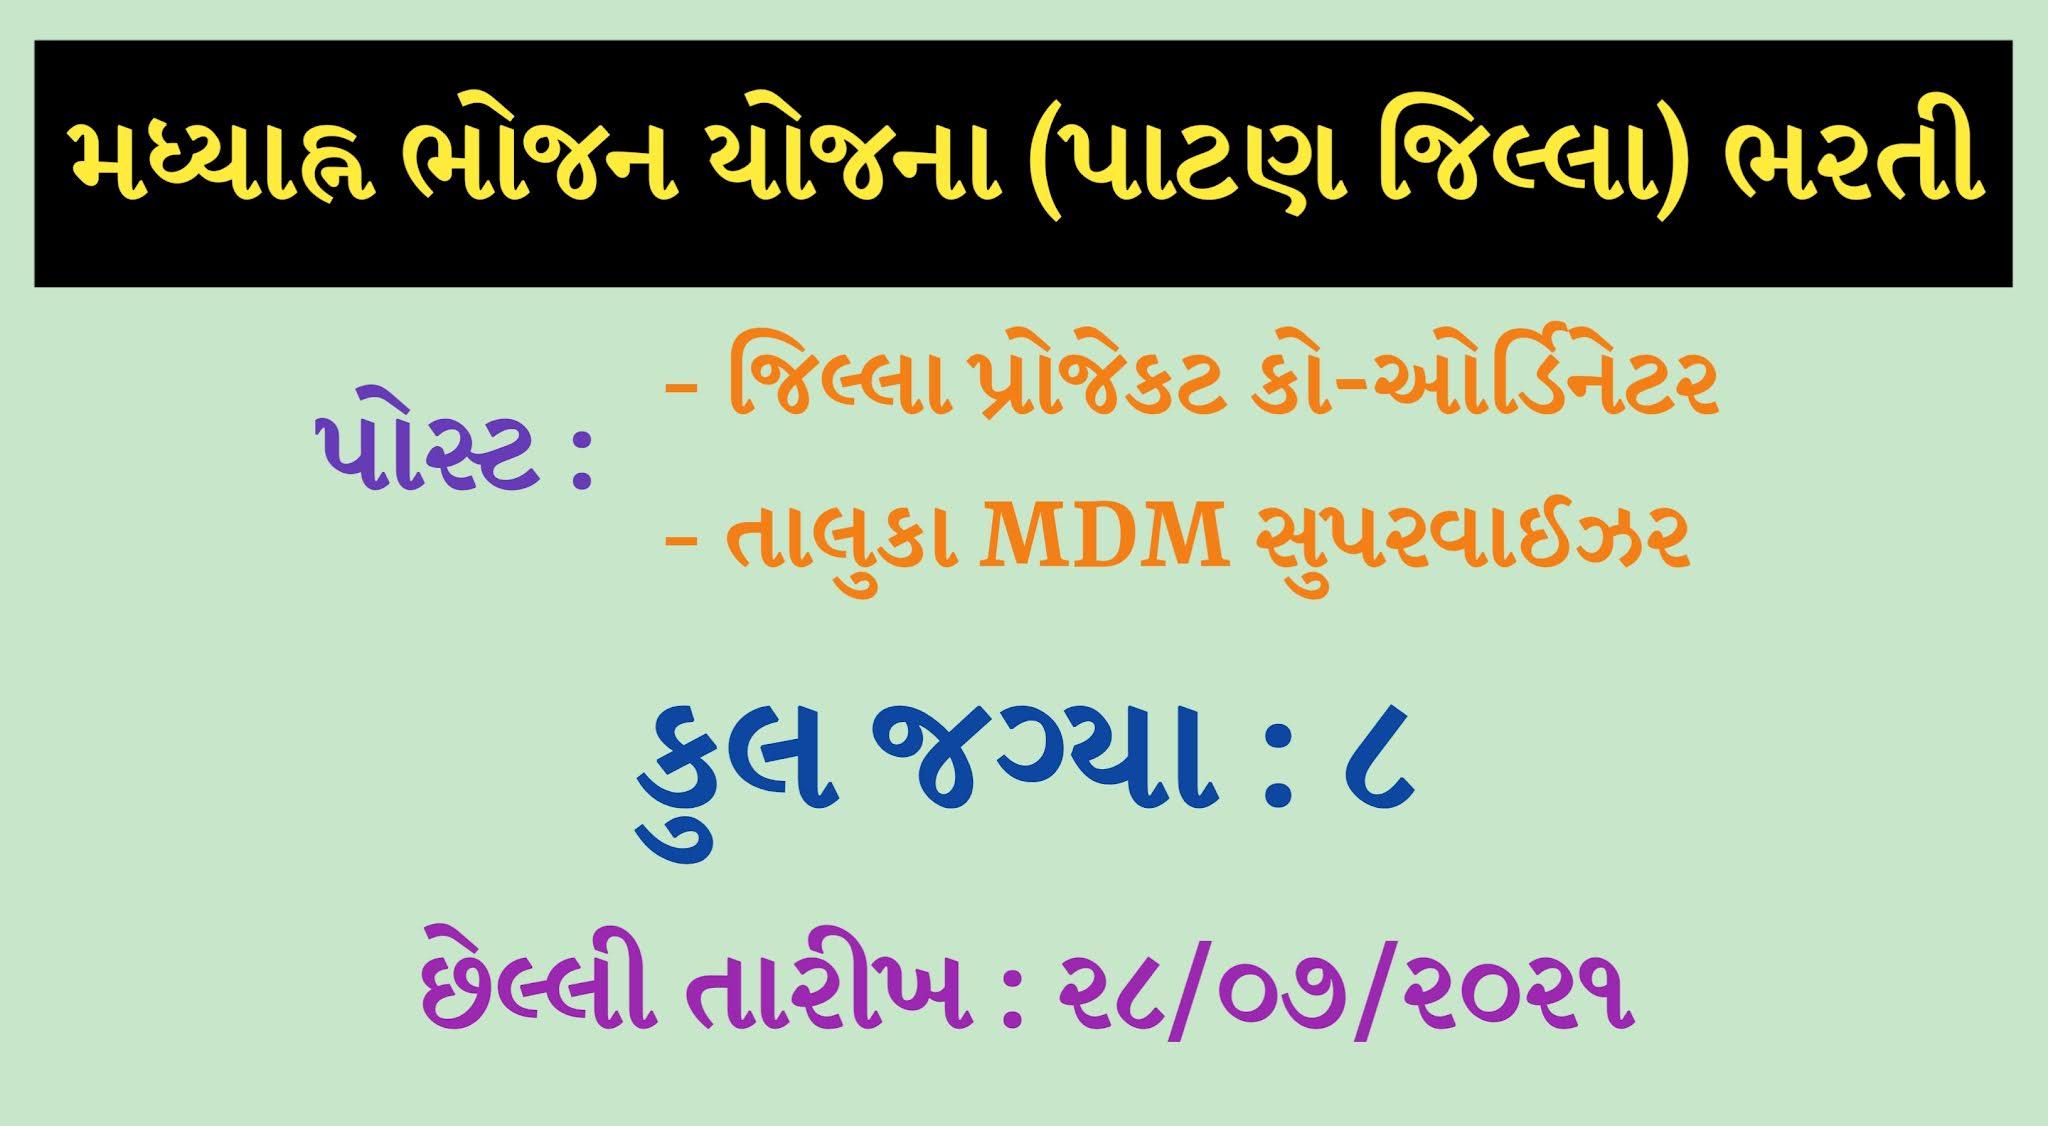 MDM Patan Recruitment 2021, MDM Recruitment 2021, Mid Day Meal Patan Recruitment 2021, Project Coordinator Recruitment 2021